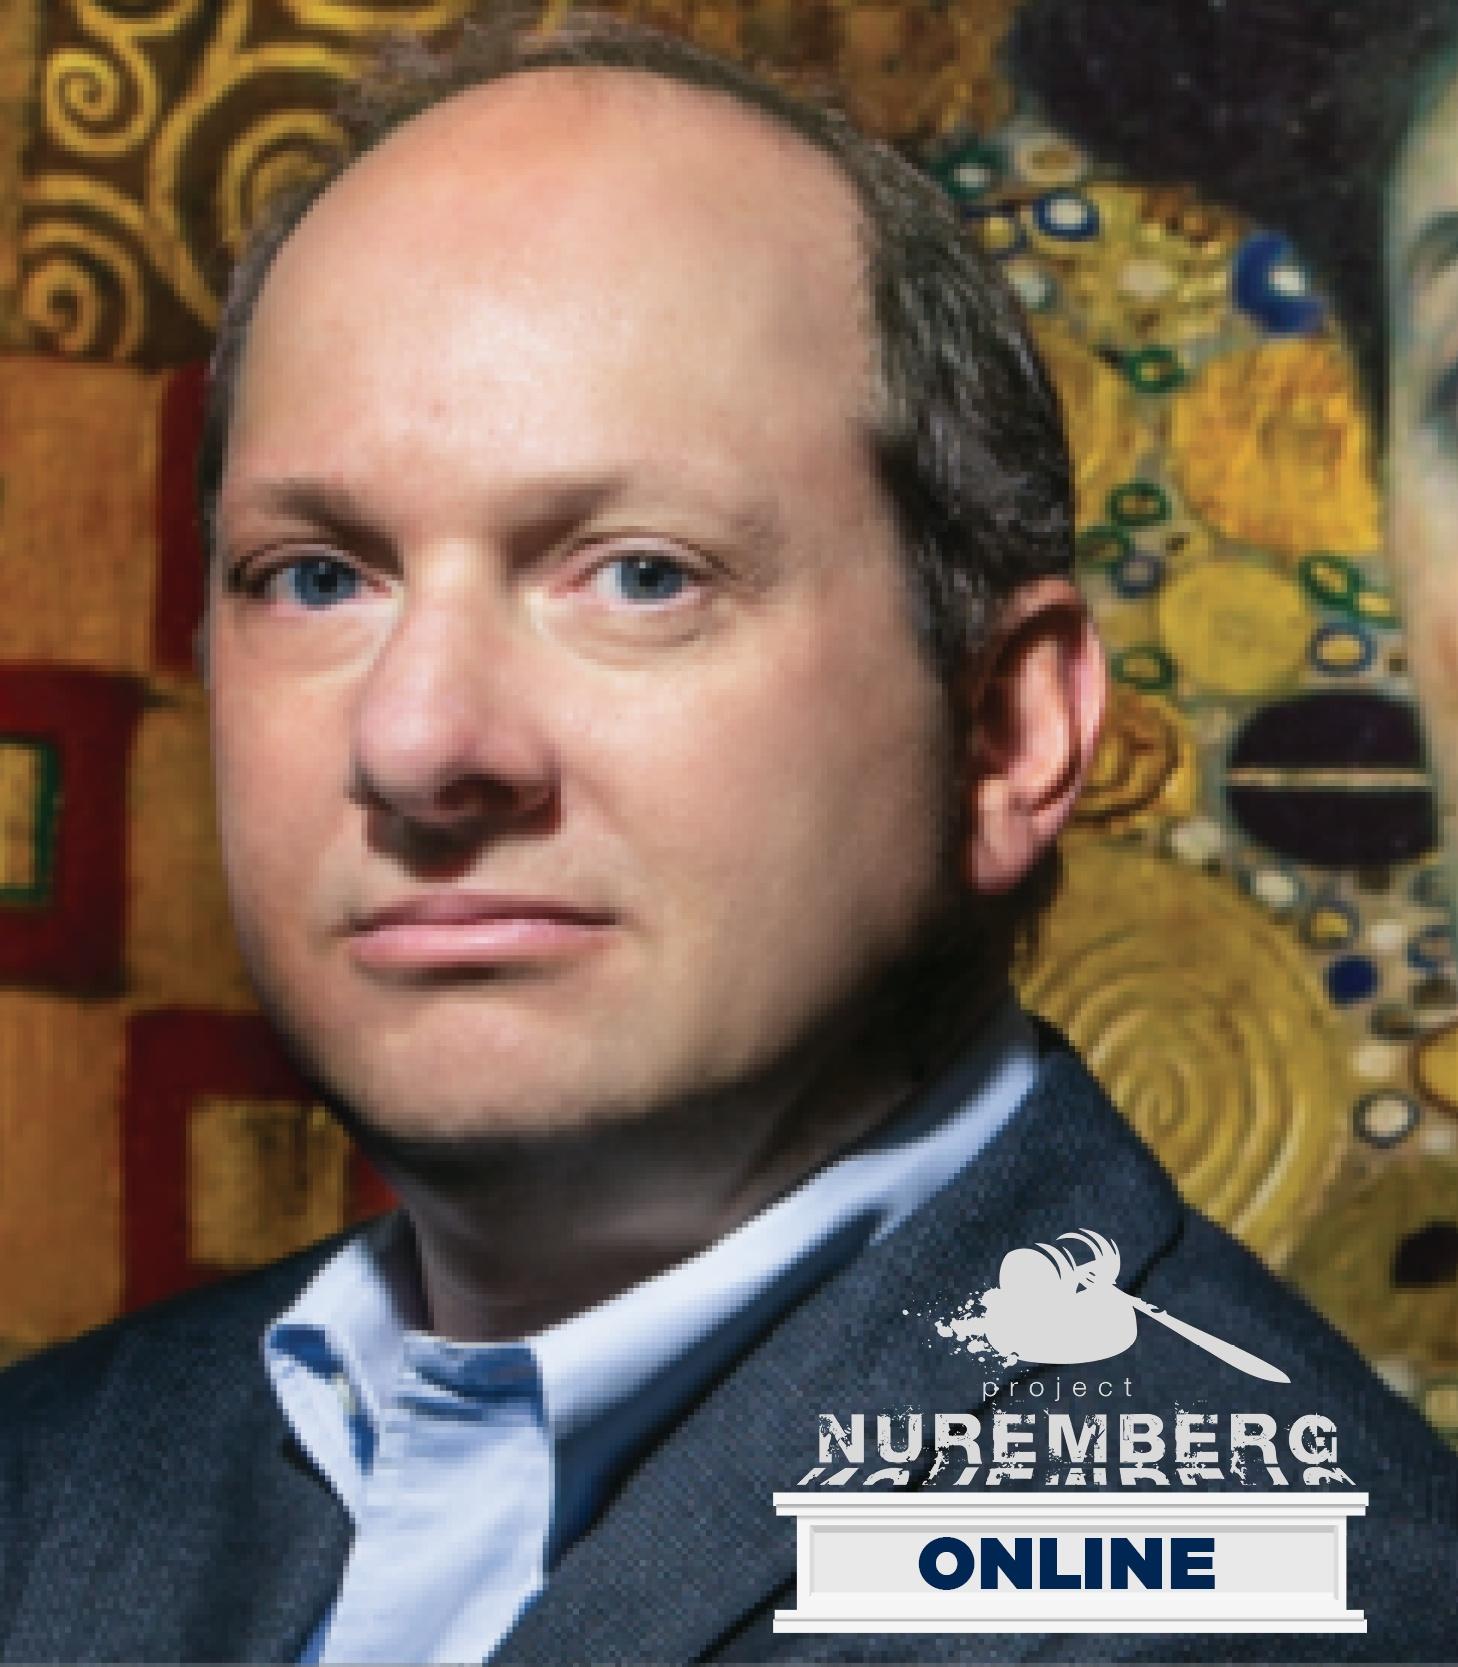 E. Randol Schoenberg for Project Nuremberg Online